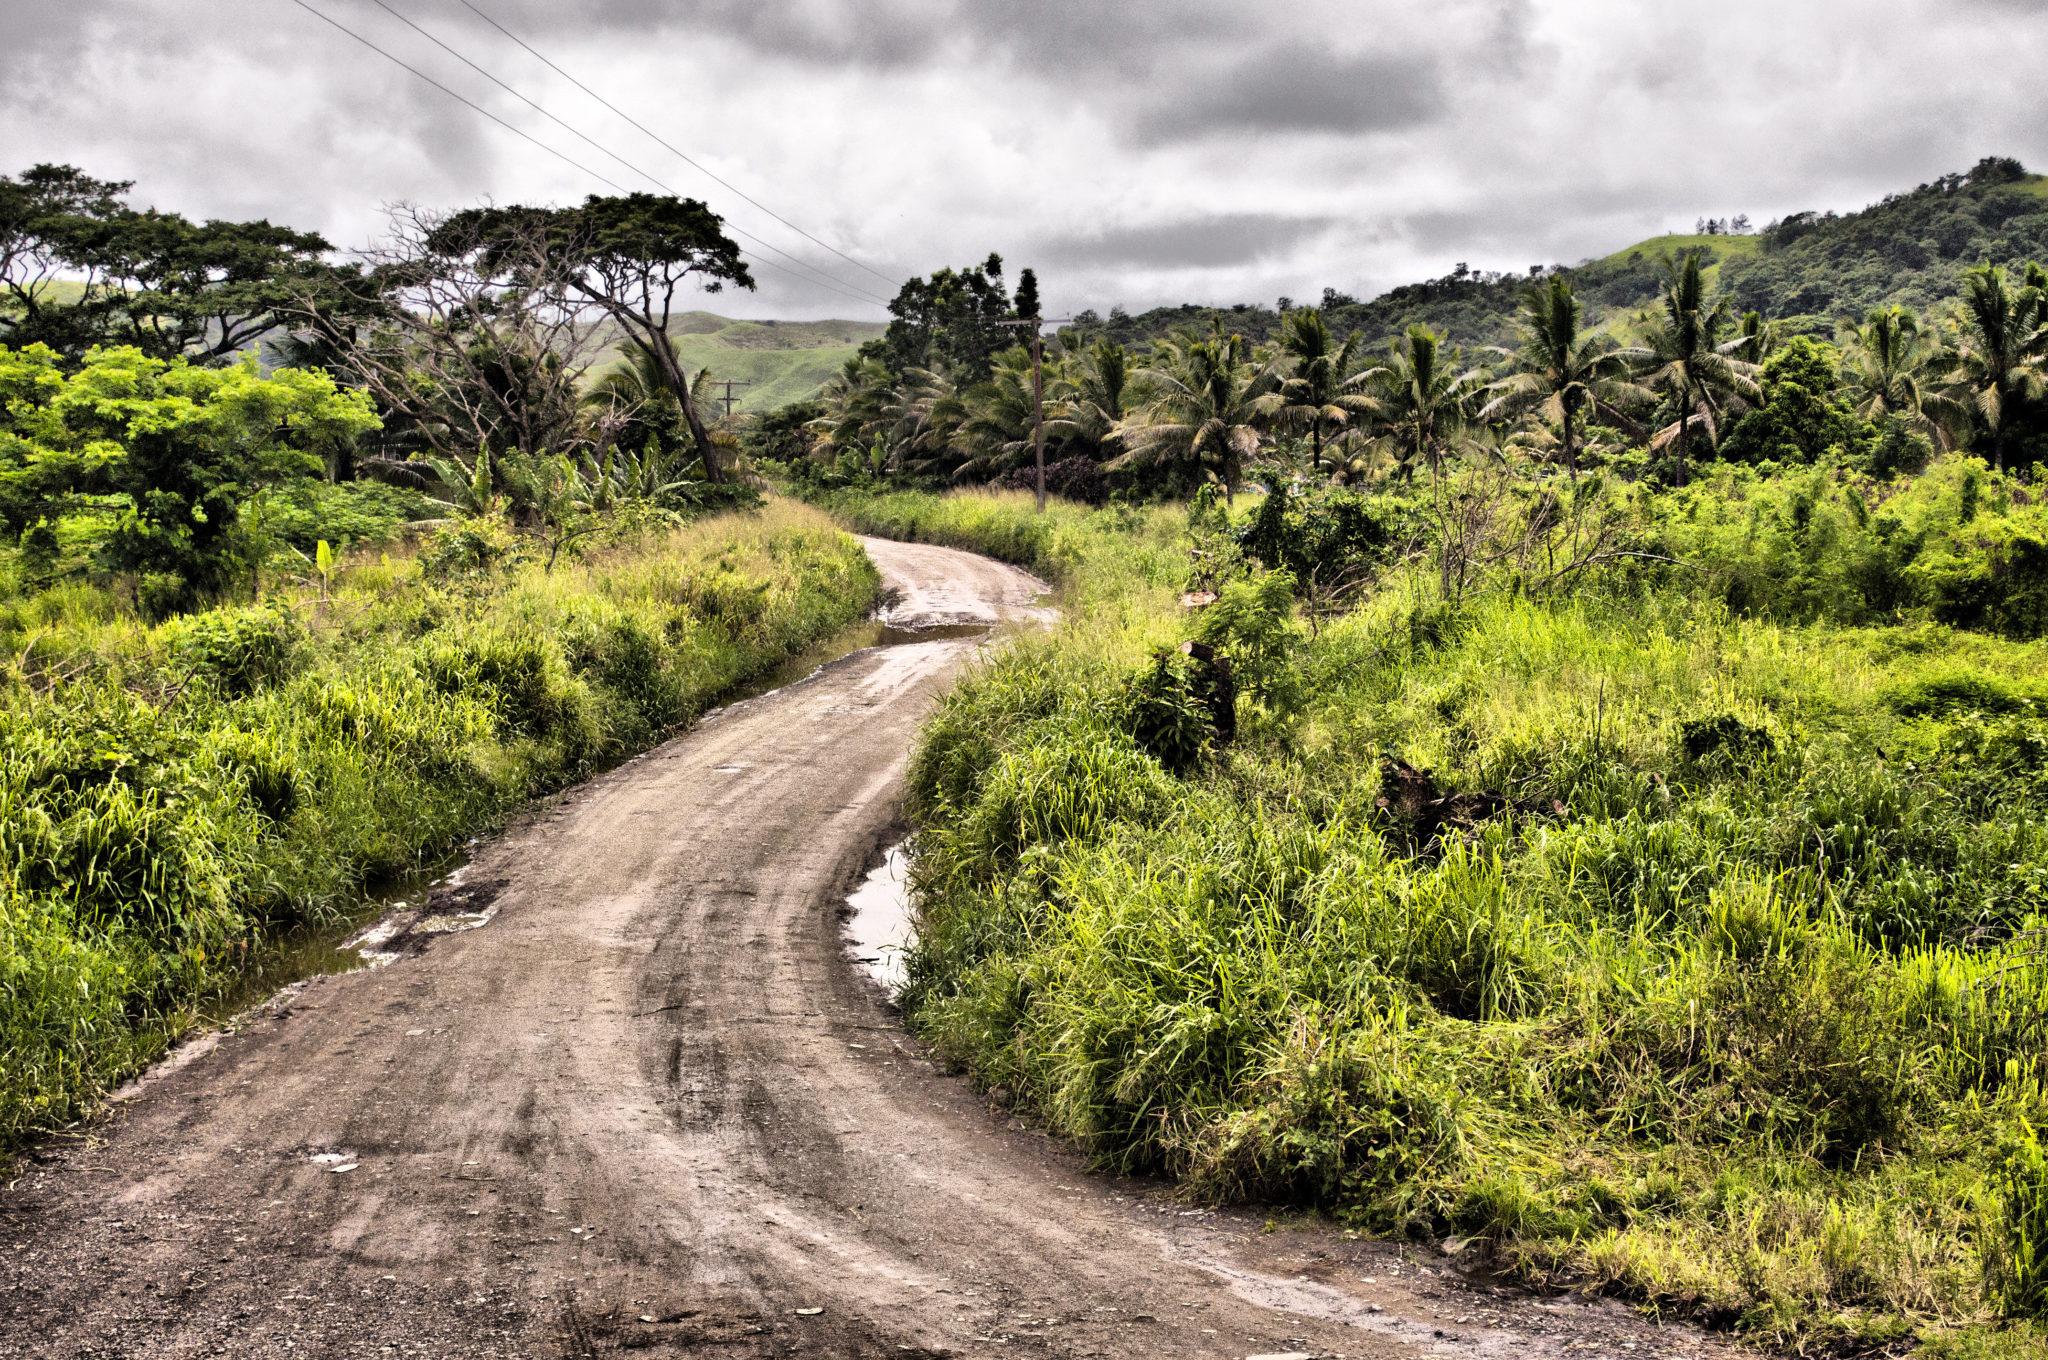 Fidschi-Inseln-Schotterweg